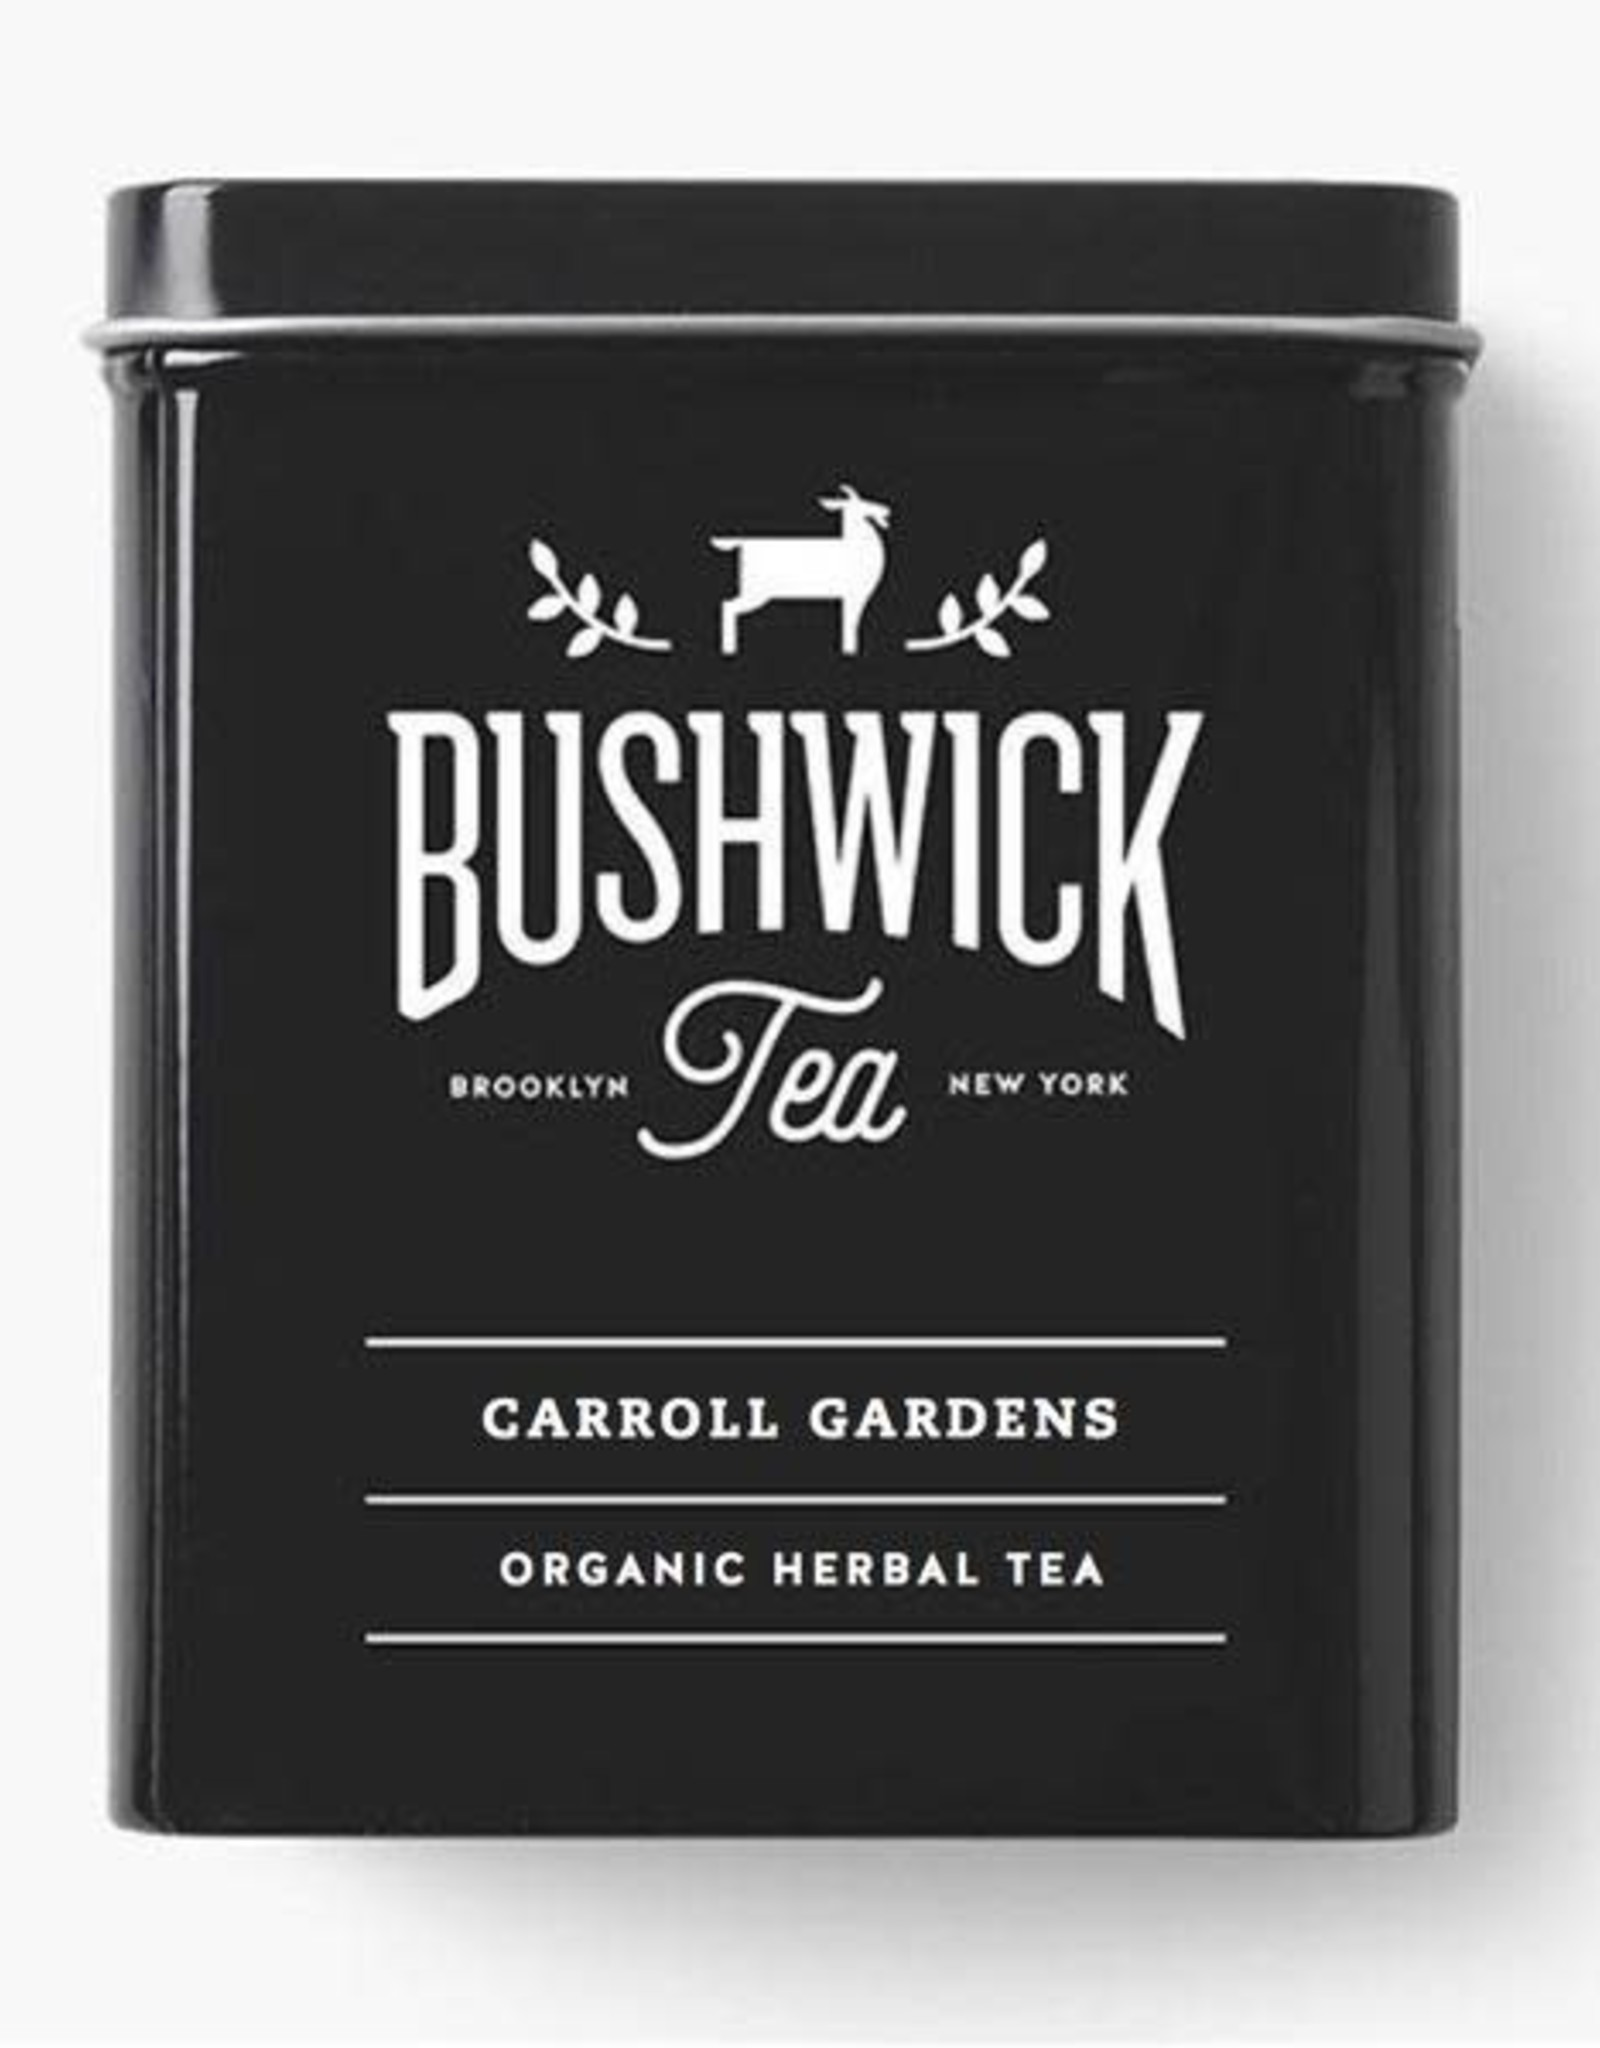 Bushwick Tea Bushwick Tea | Tea Tin